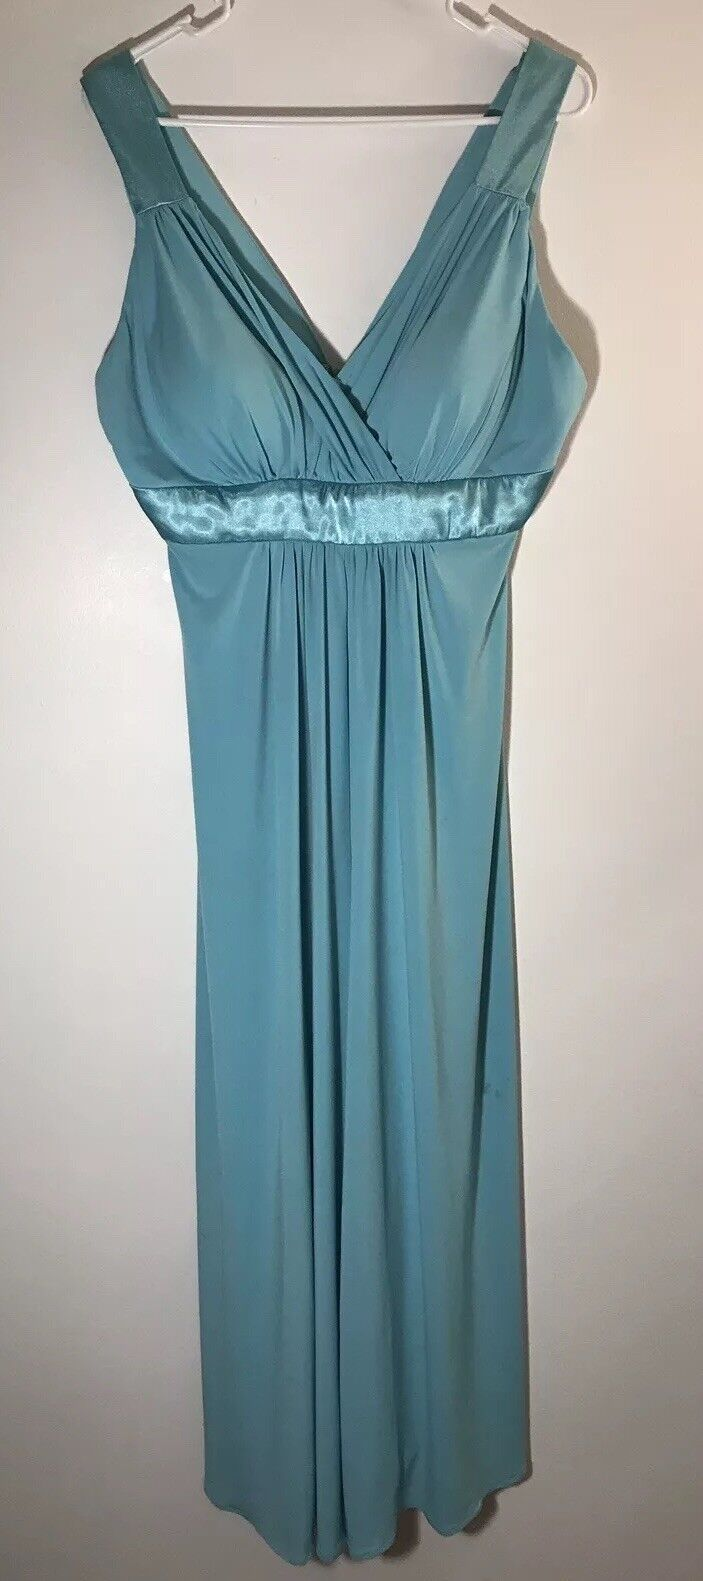 DAVIDS BRIDAL Bridesmaid Dress Size 12 Aqua Style F13095 Lot# 503896 Sleeveless